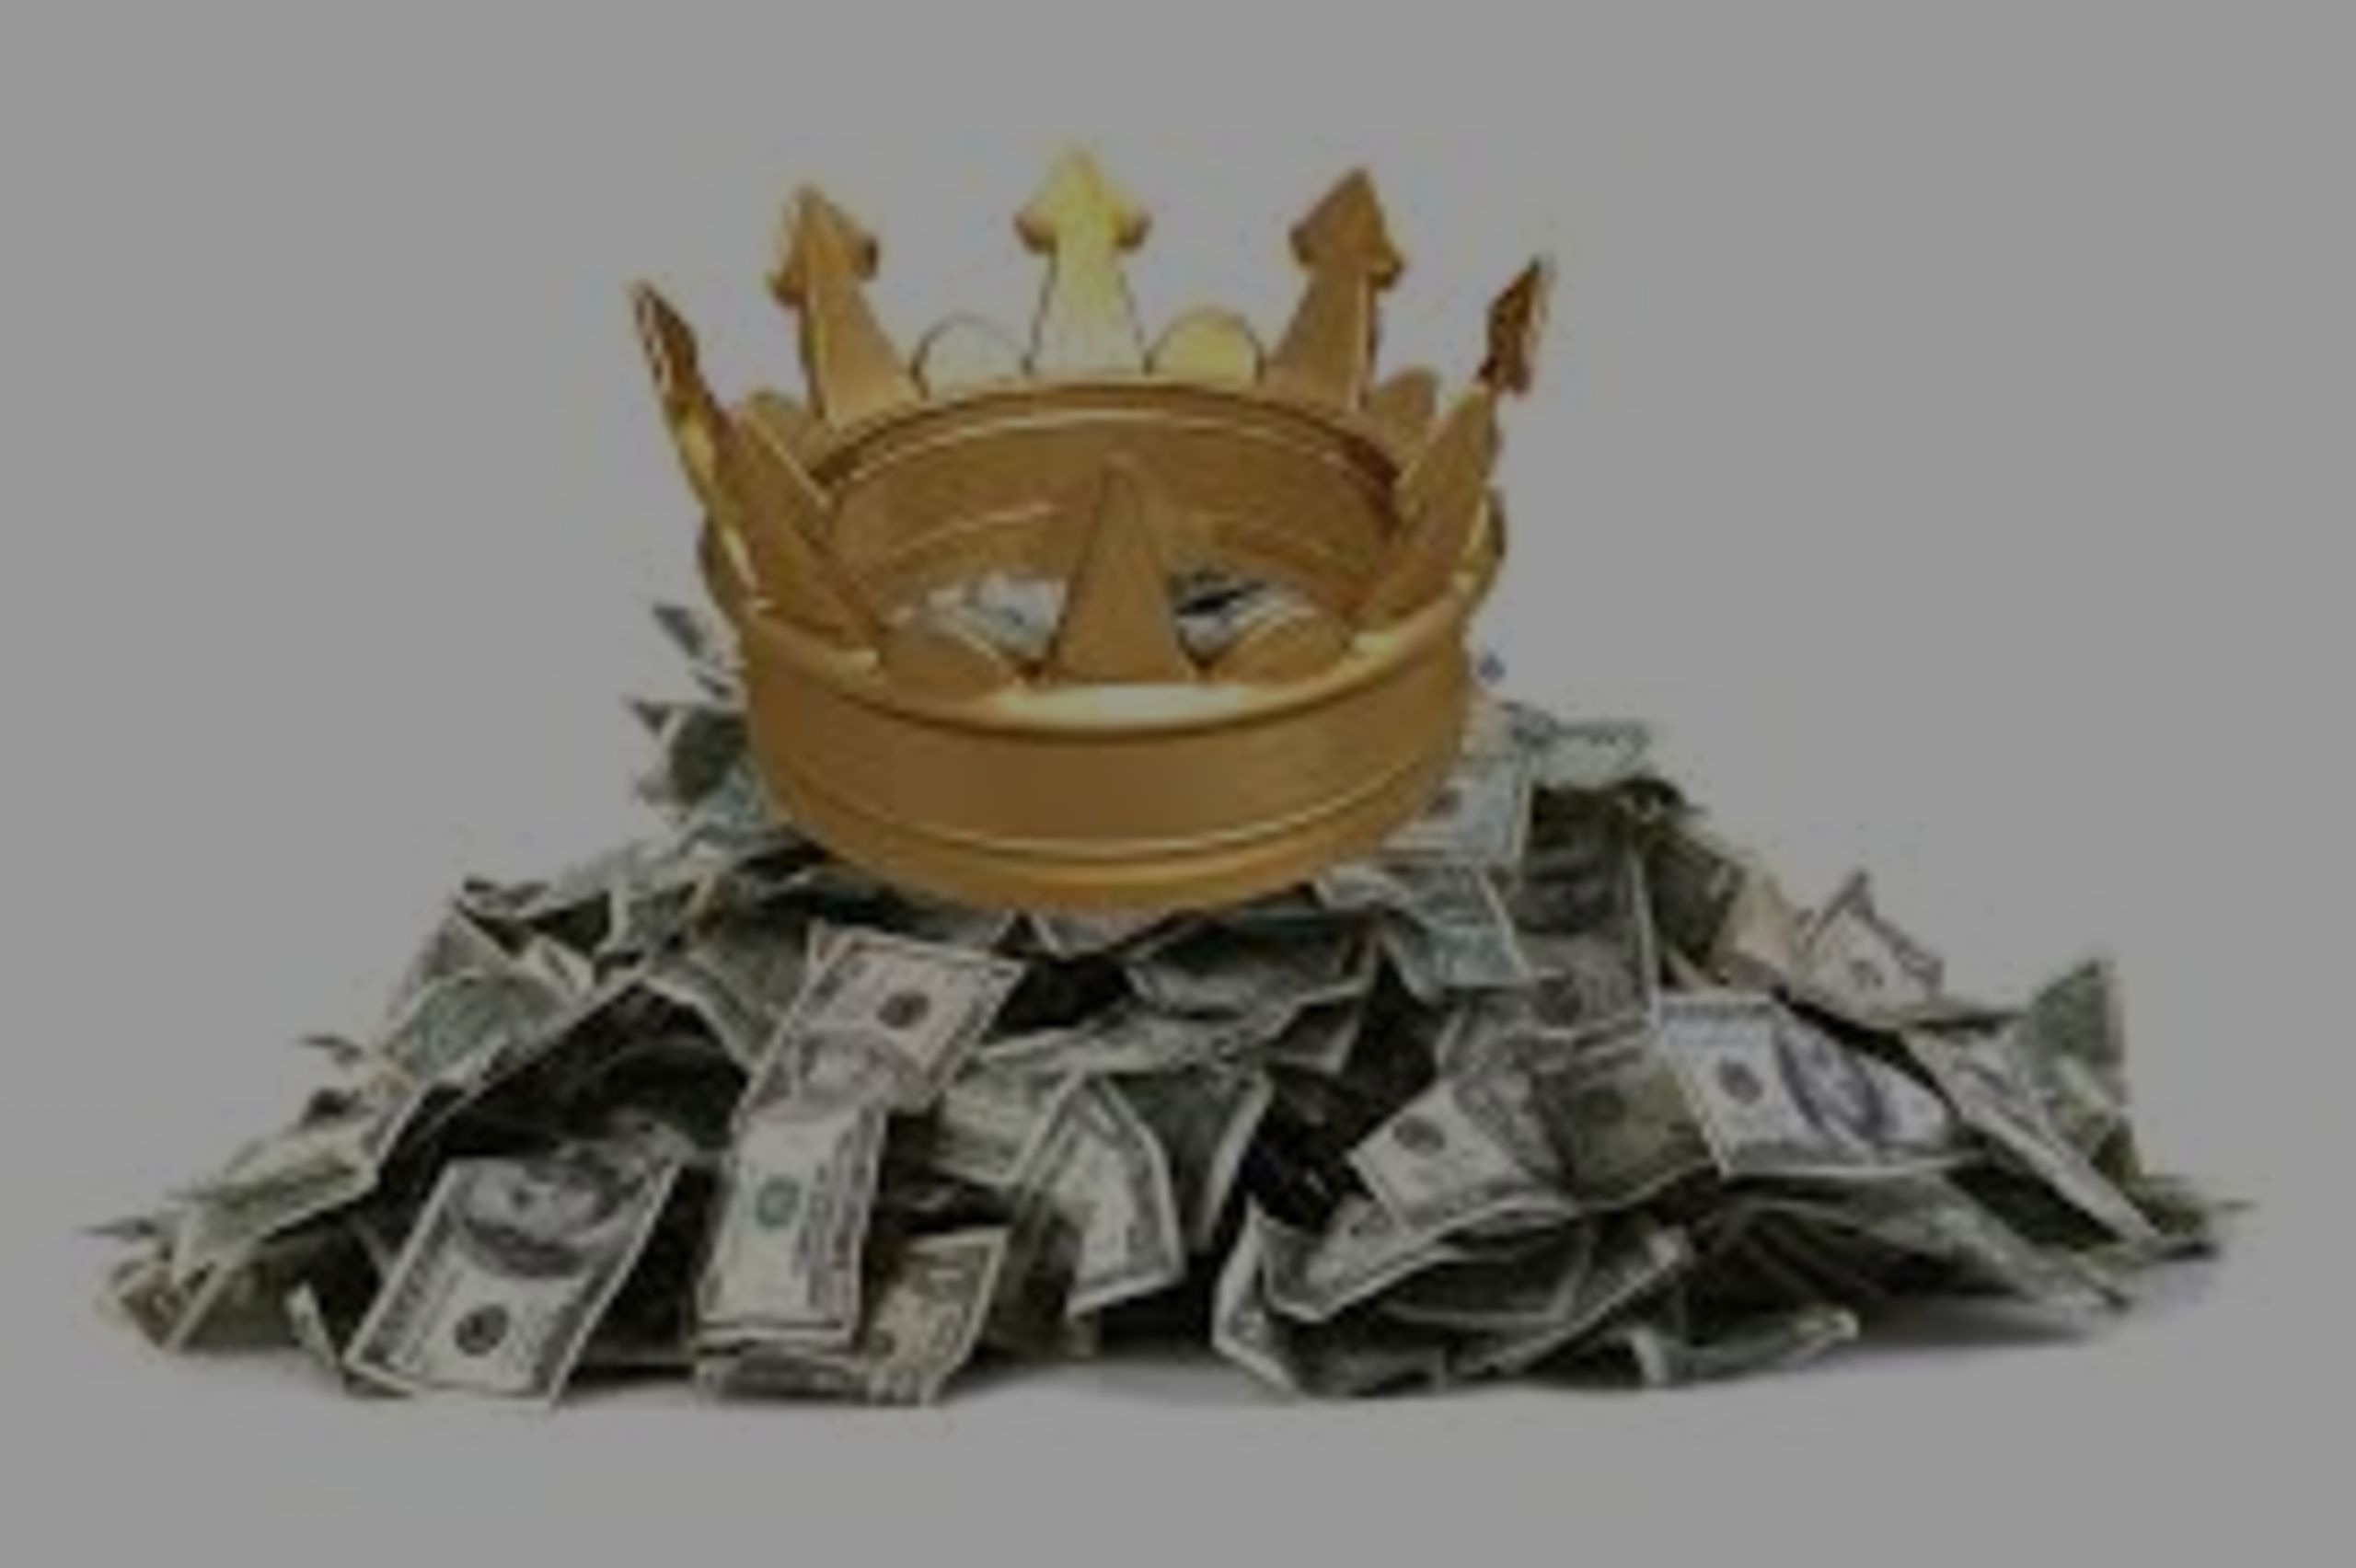 Cash Investors cash in on Coronavirus (COVID-19)